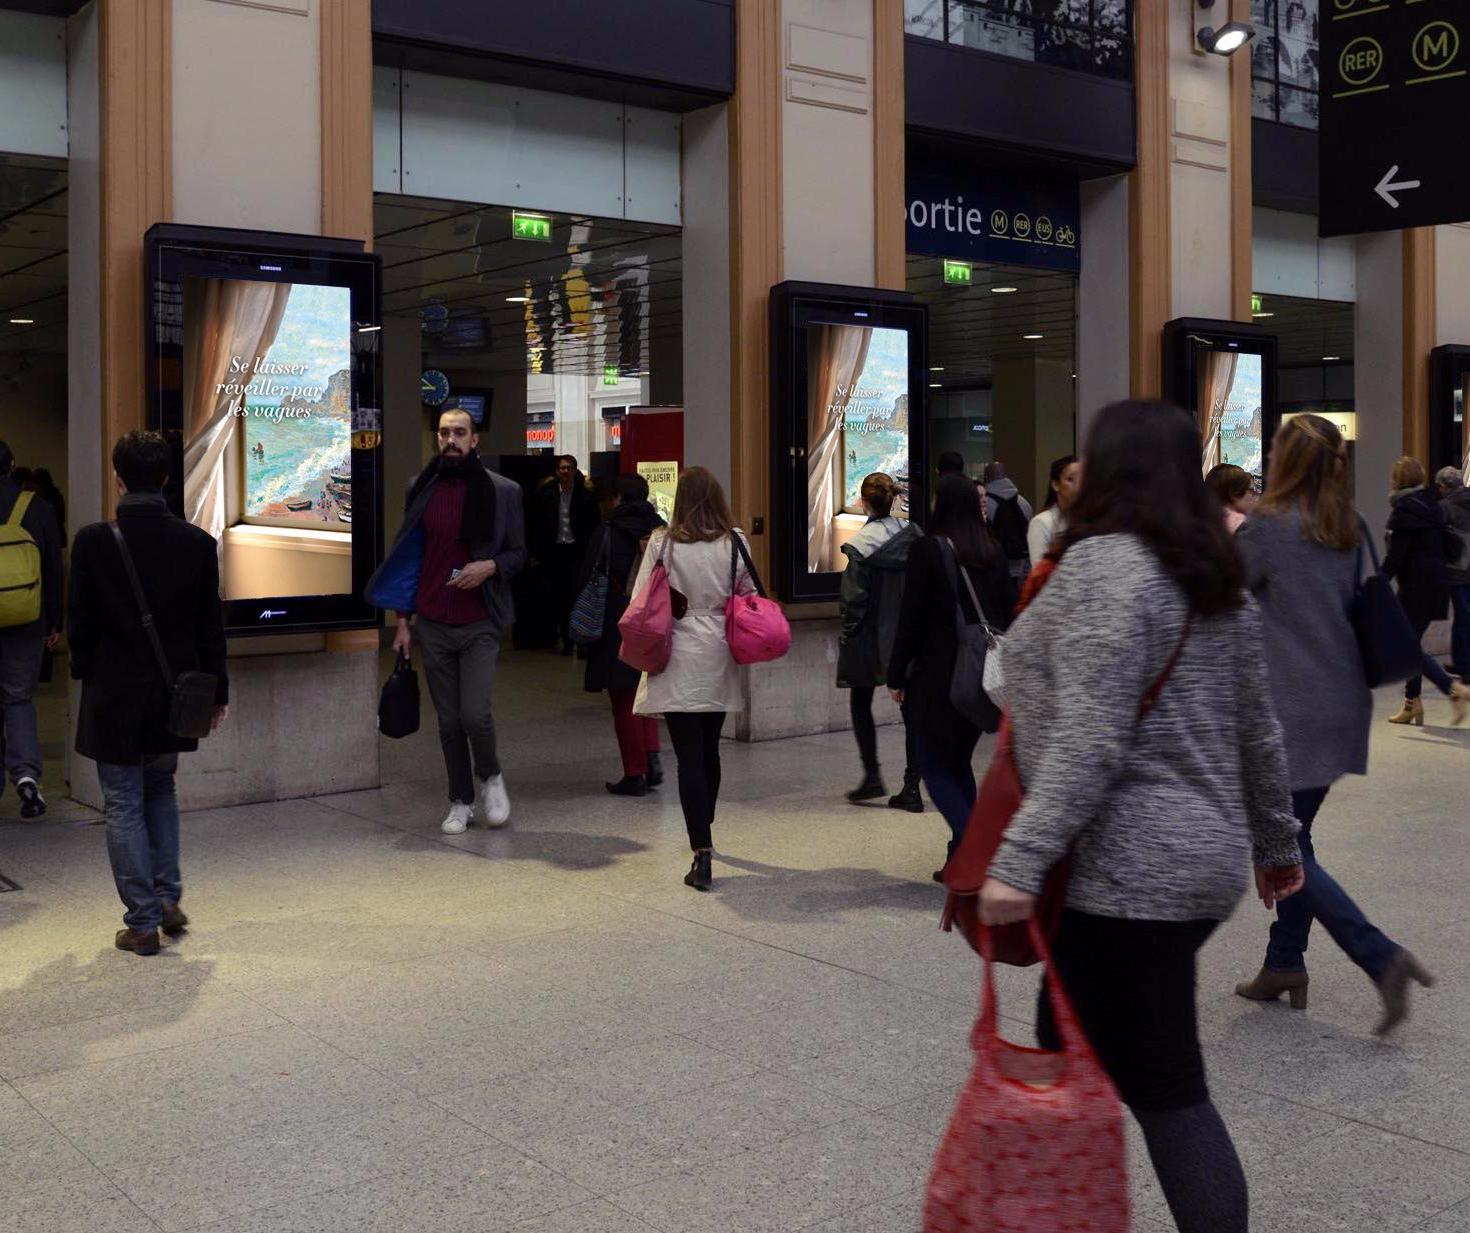 Voyages-impressionnistes-en-gare-Saint-Lazare.jpg